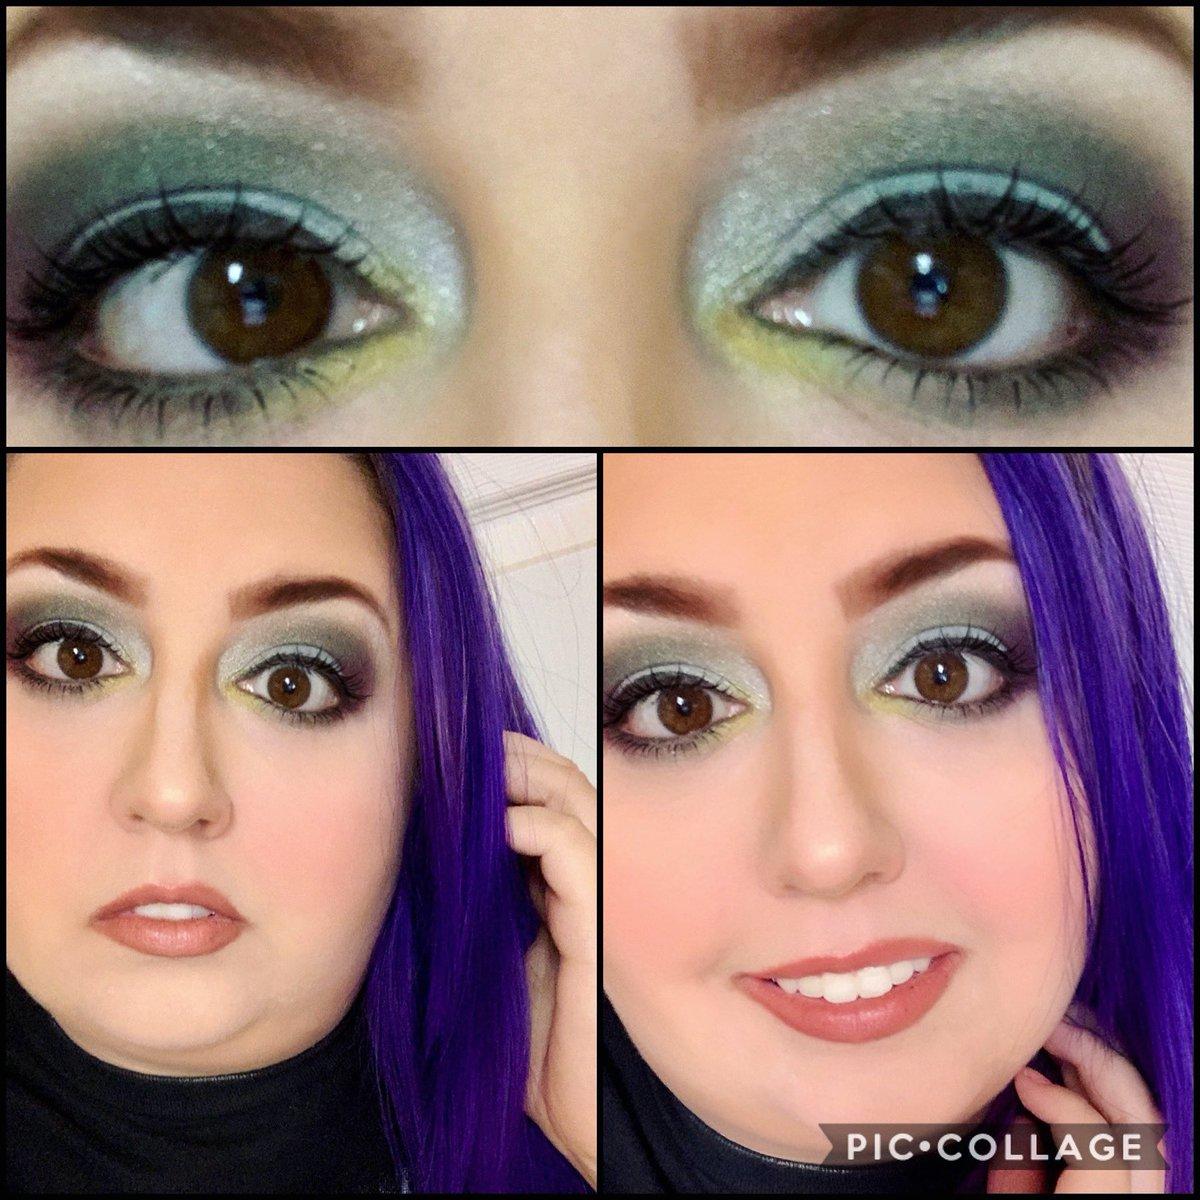 Be proud of your beauty! 😊😃❤️ @JeffreeStar @jeffreestarcos @shanedawson #jeffreestarcosmetics #jeffreestarapproved #conspiracypalette #makeup #makeuplooks #makeuplover #makeupoftheday #motd #jeffreestar #shanexjeffreestar #Gemini #geminheart #purplehair